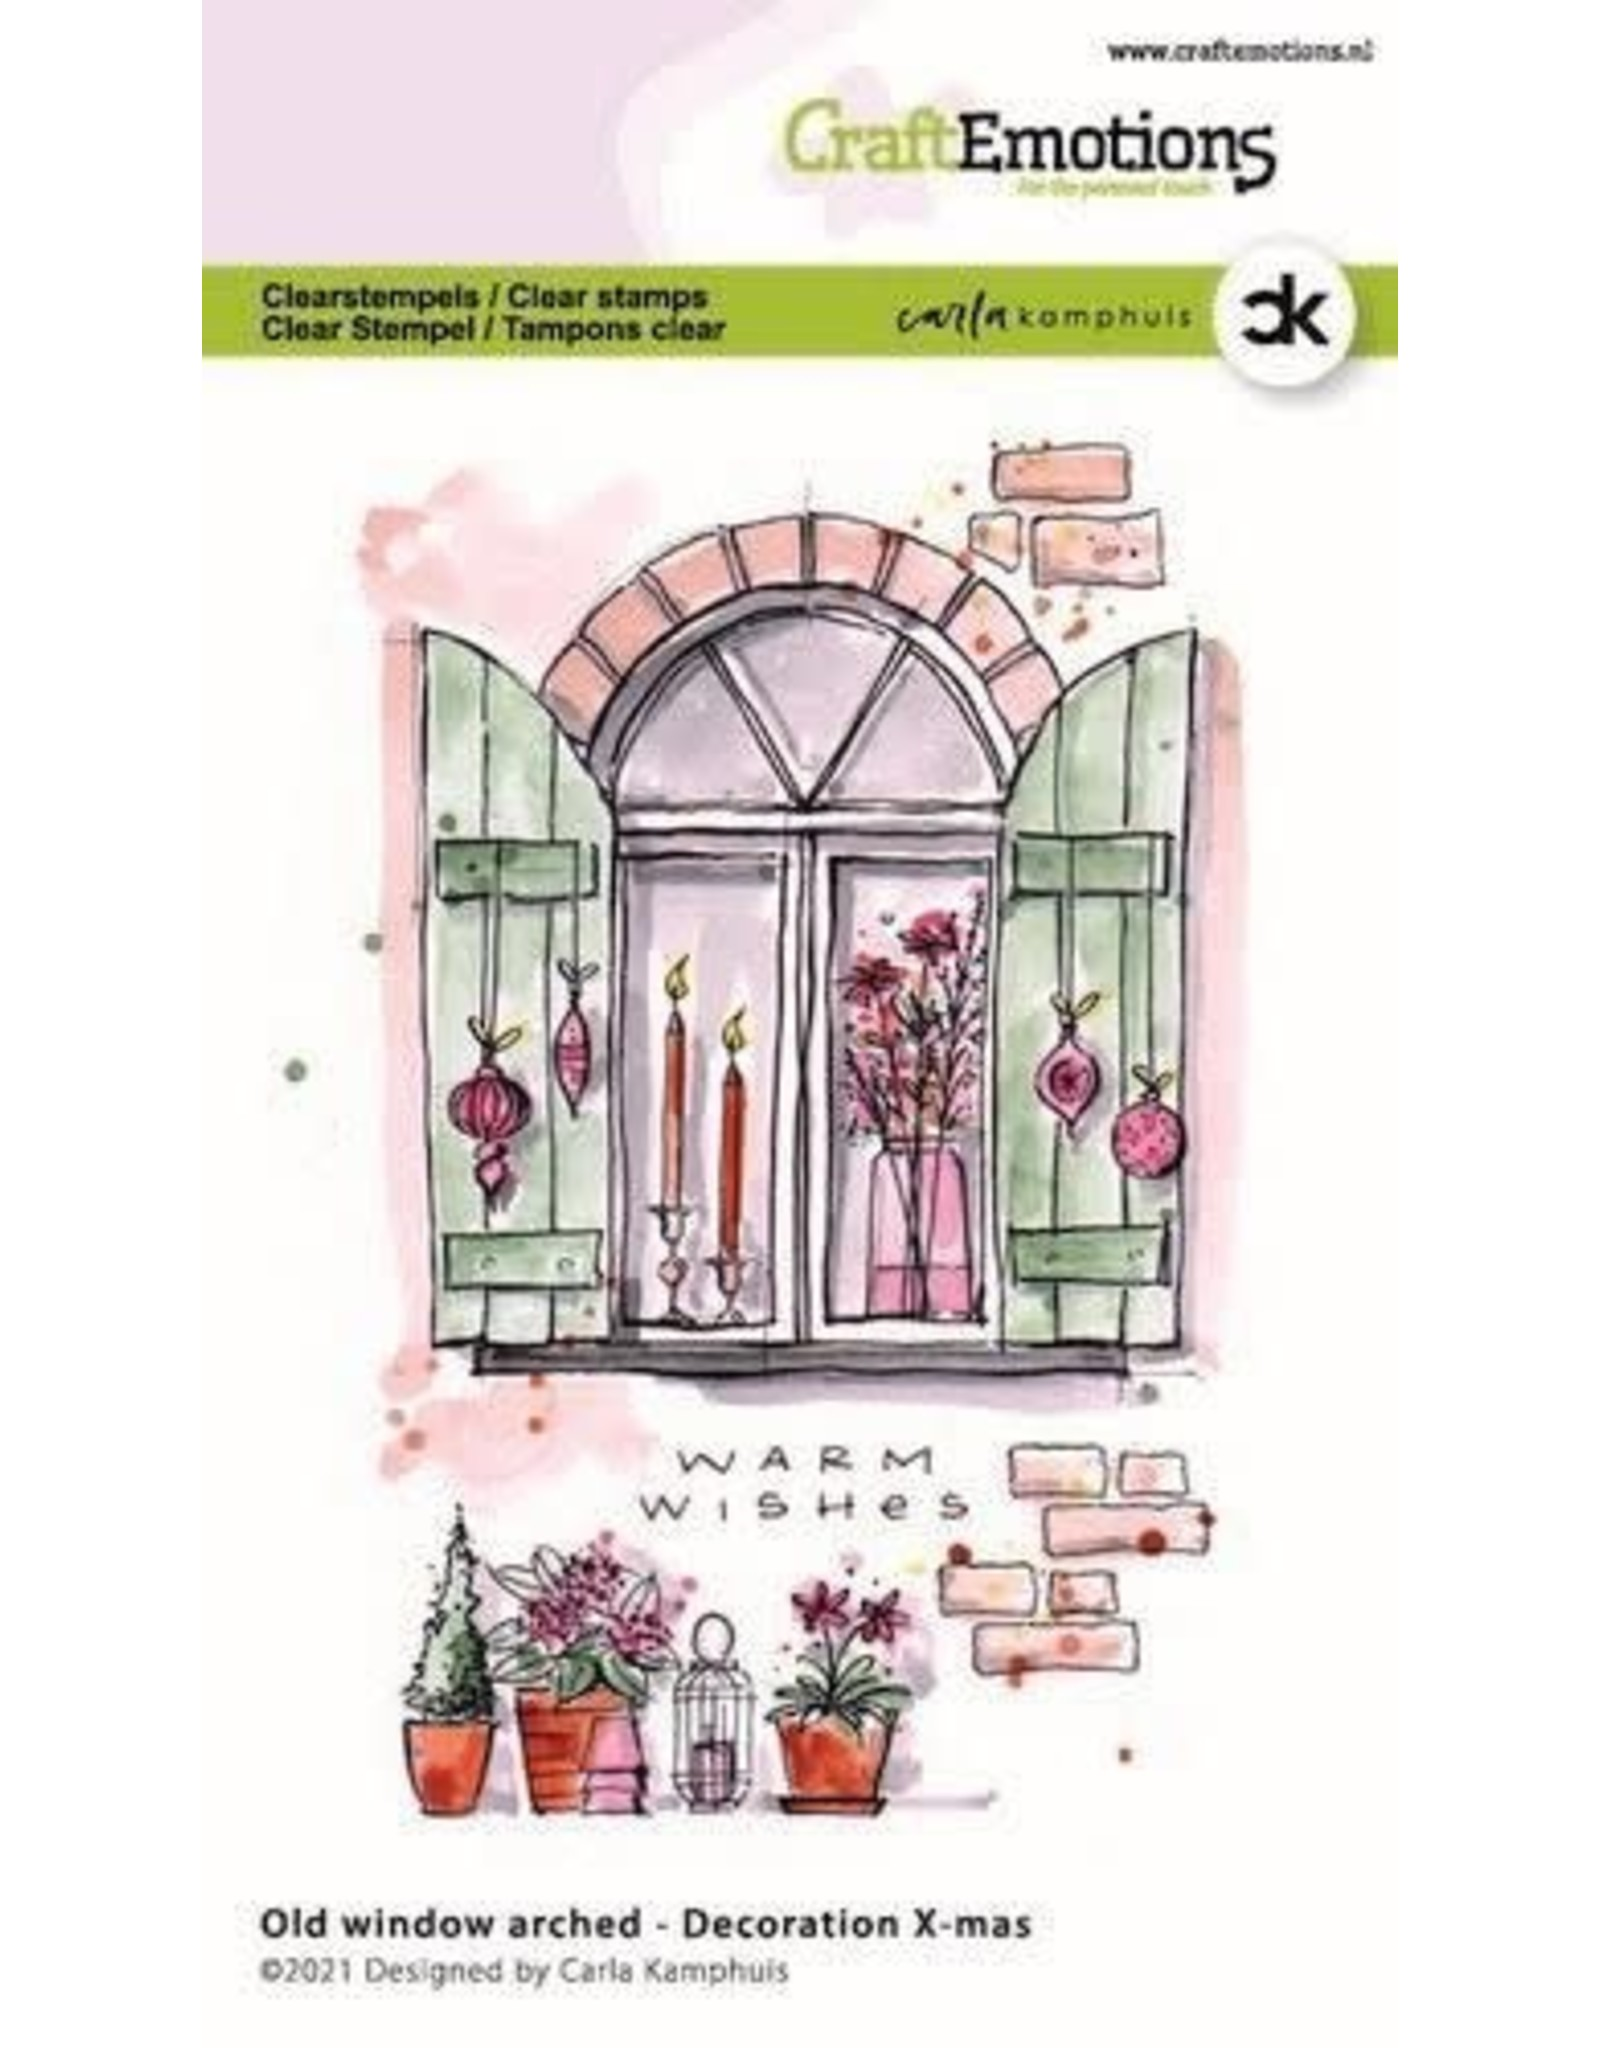 Craft Emotions CraftEmotions clearstamps A6 - Oud raam met toog - Decoration X-mas Carla Kamphuis